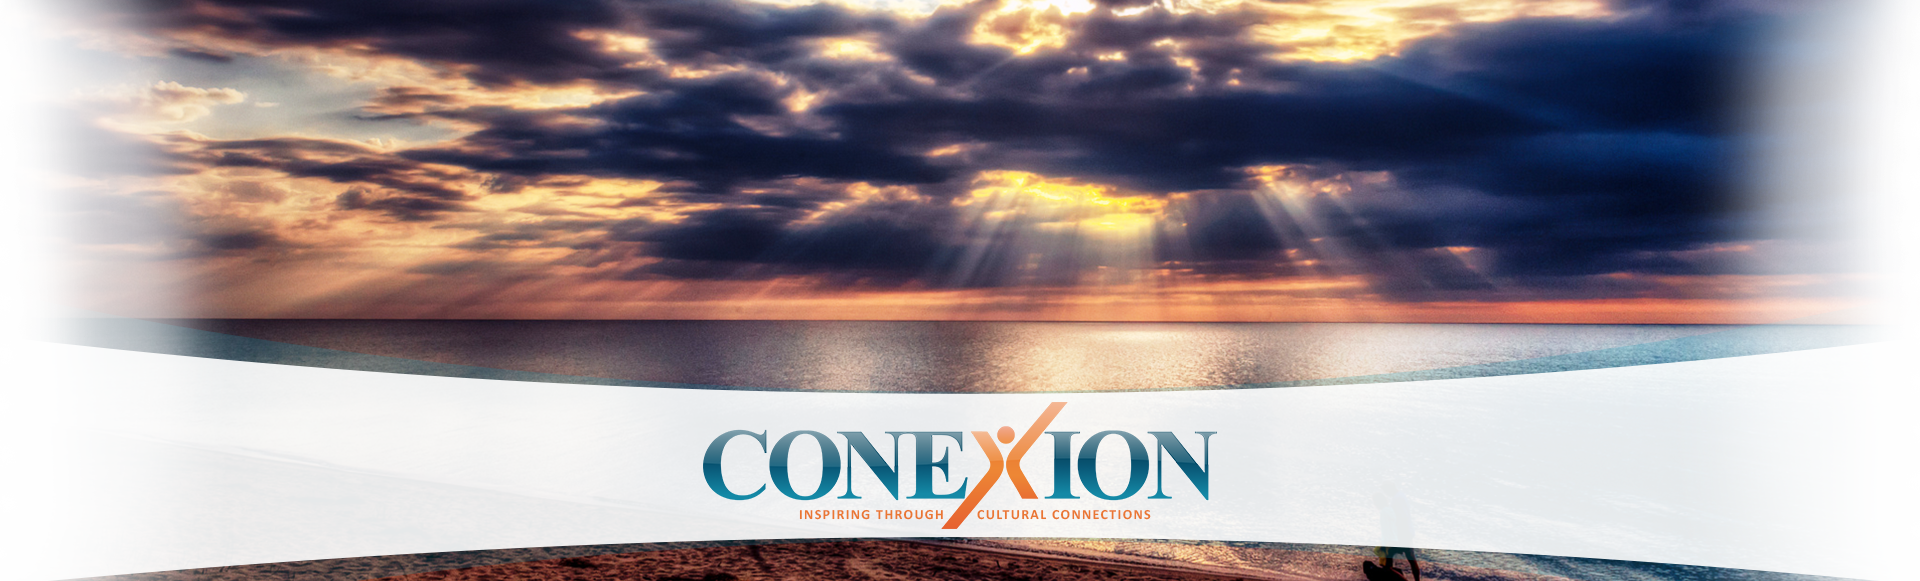 Web Banner Conextion 3